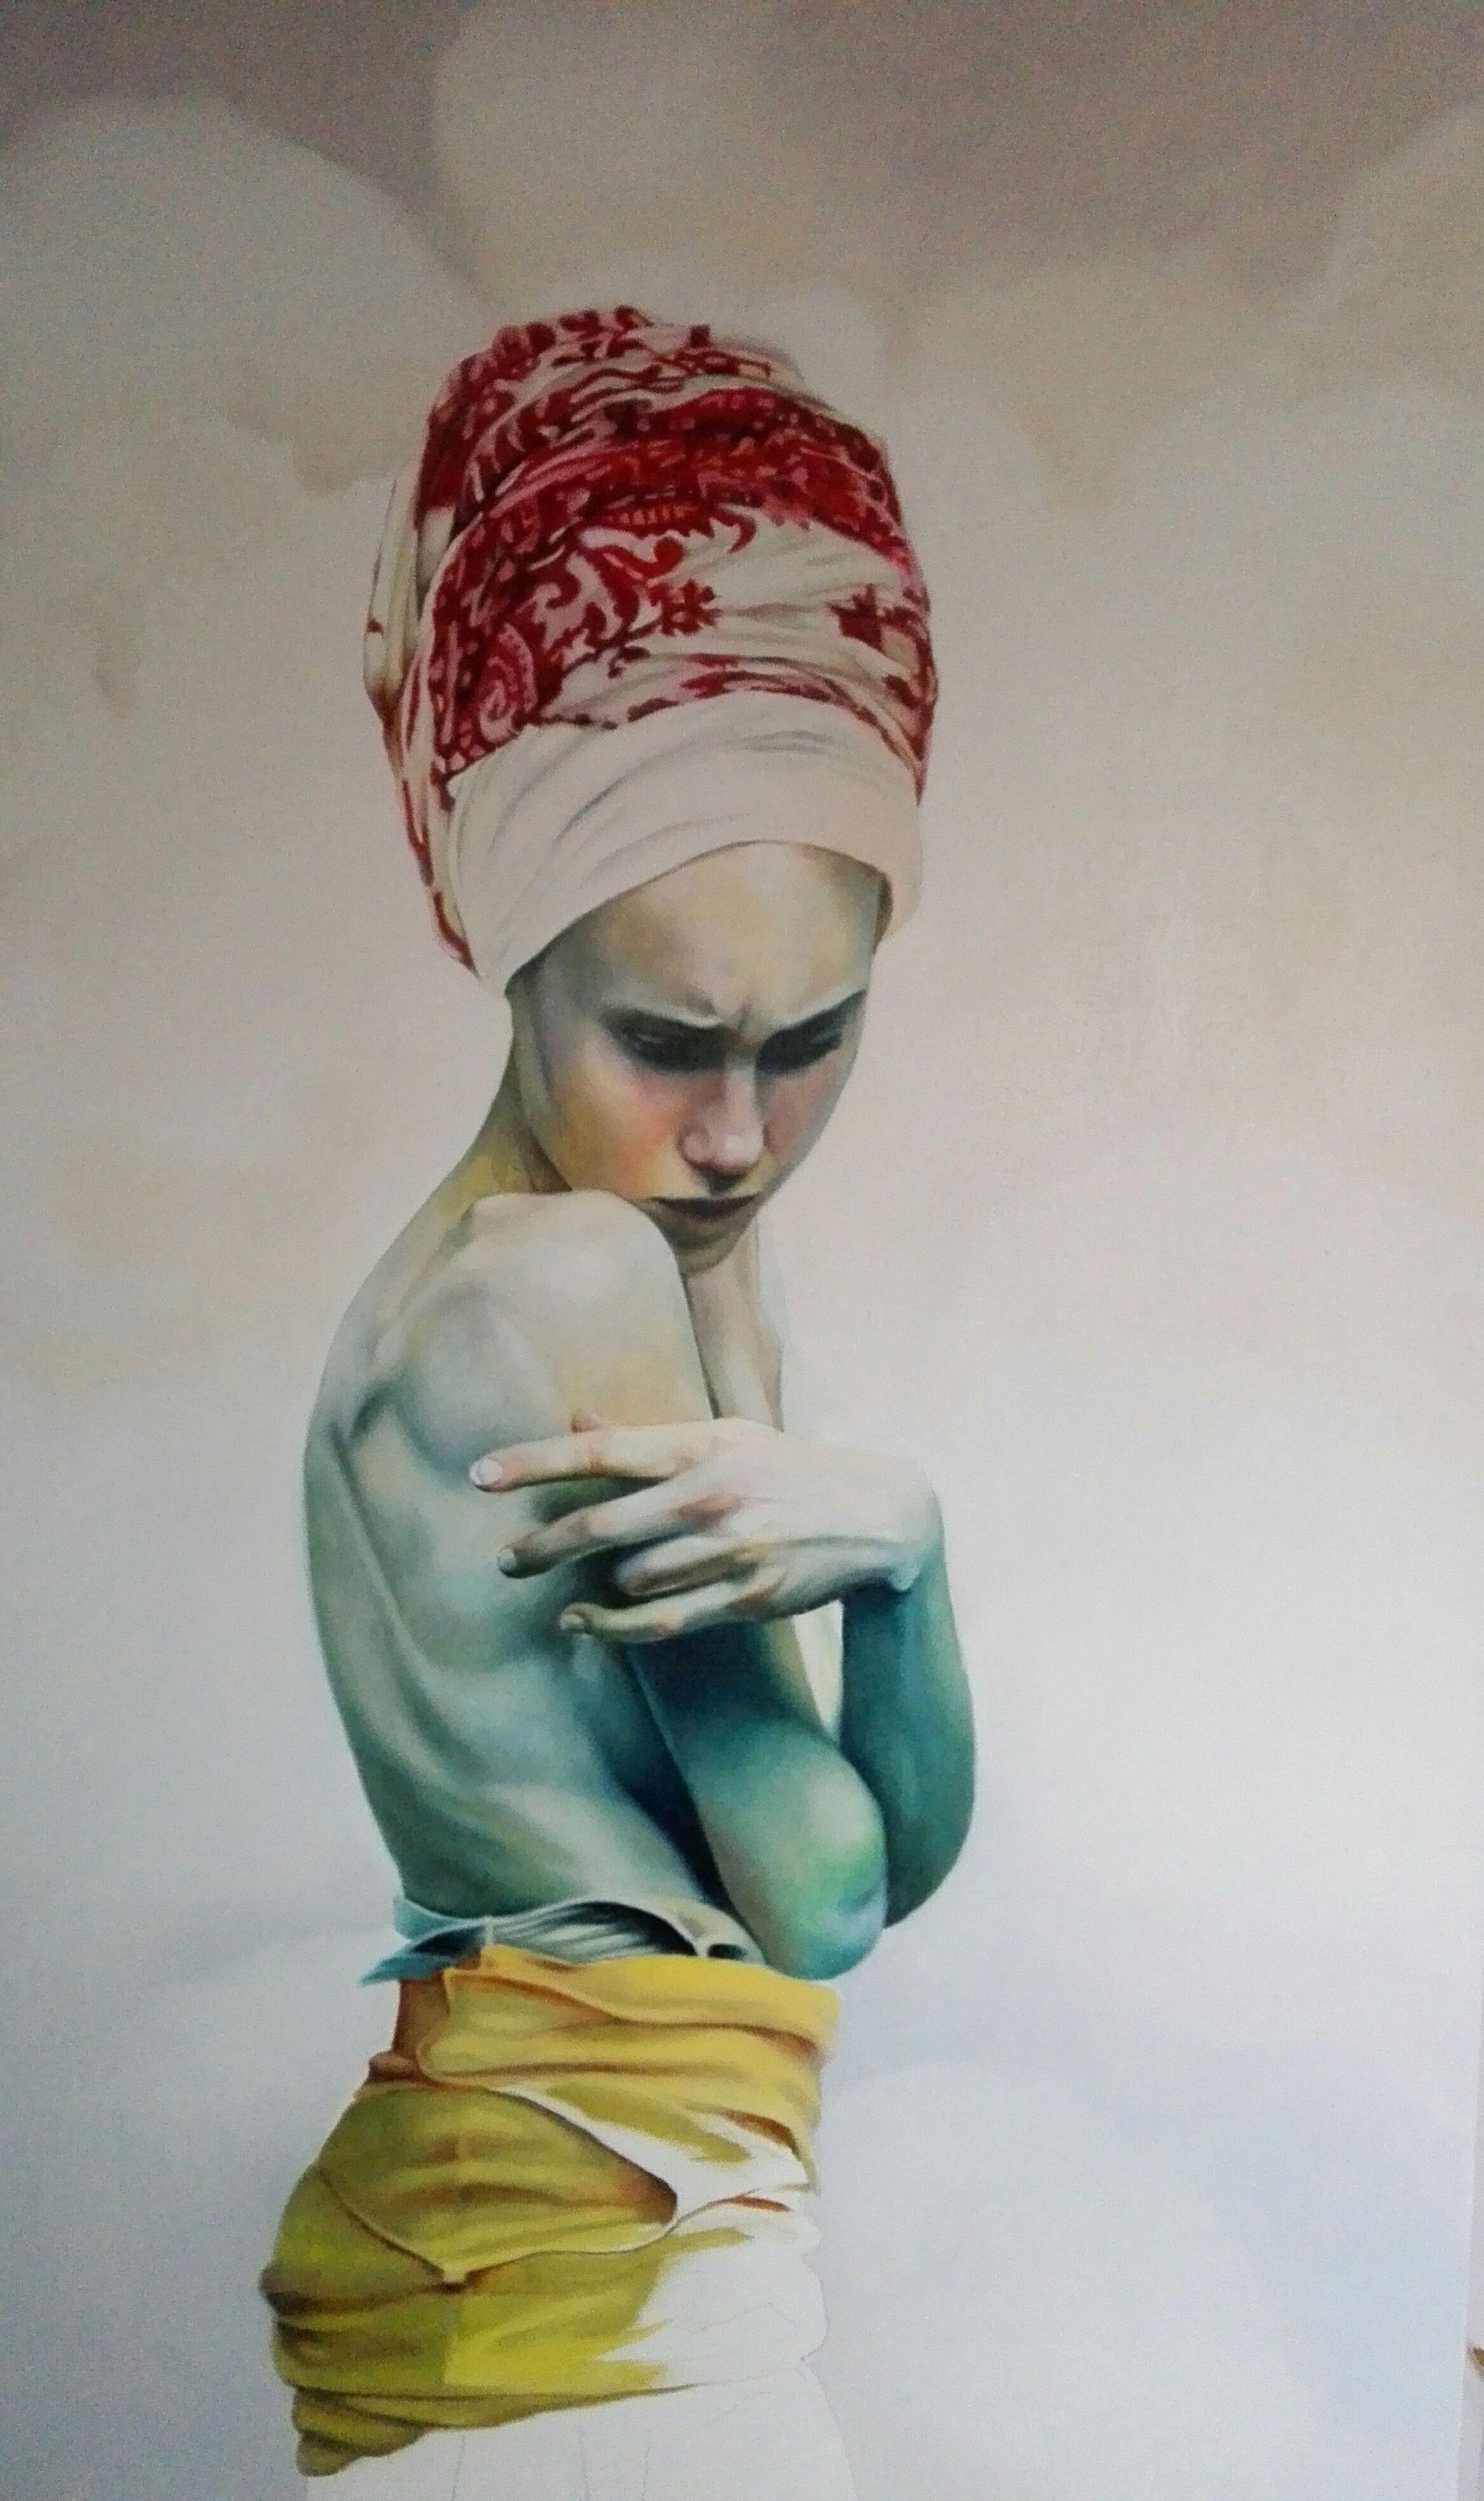 Obra de una pintora local Inma Peña, ven a verla! www.studio2b.es